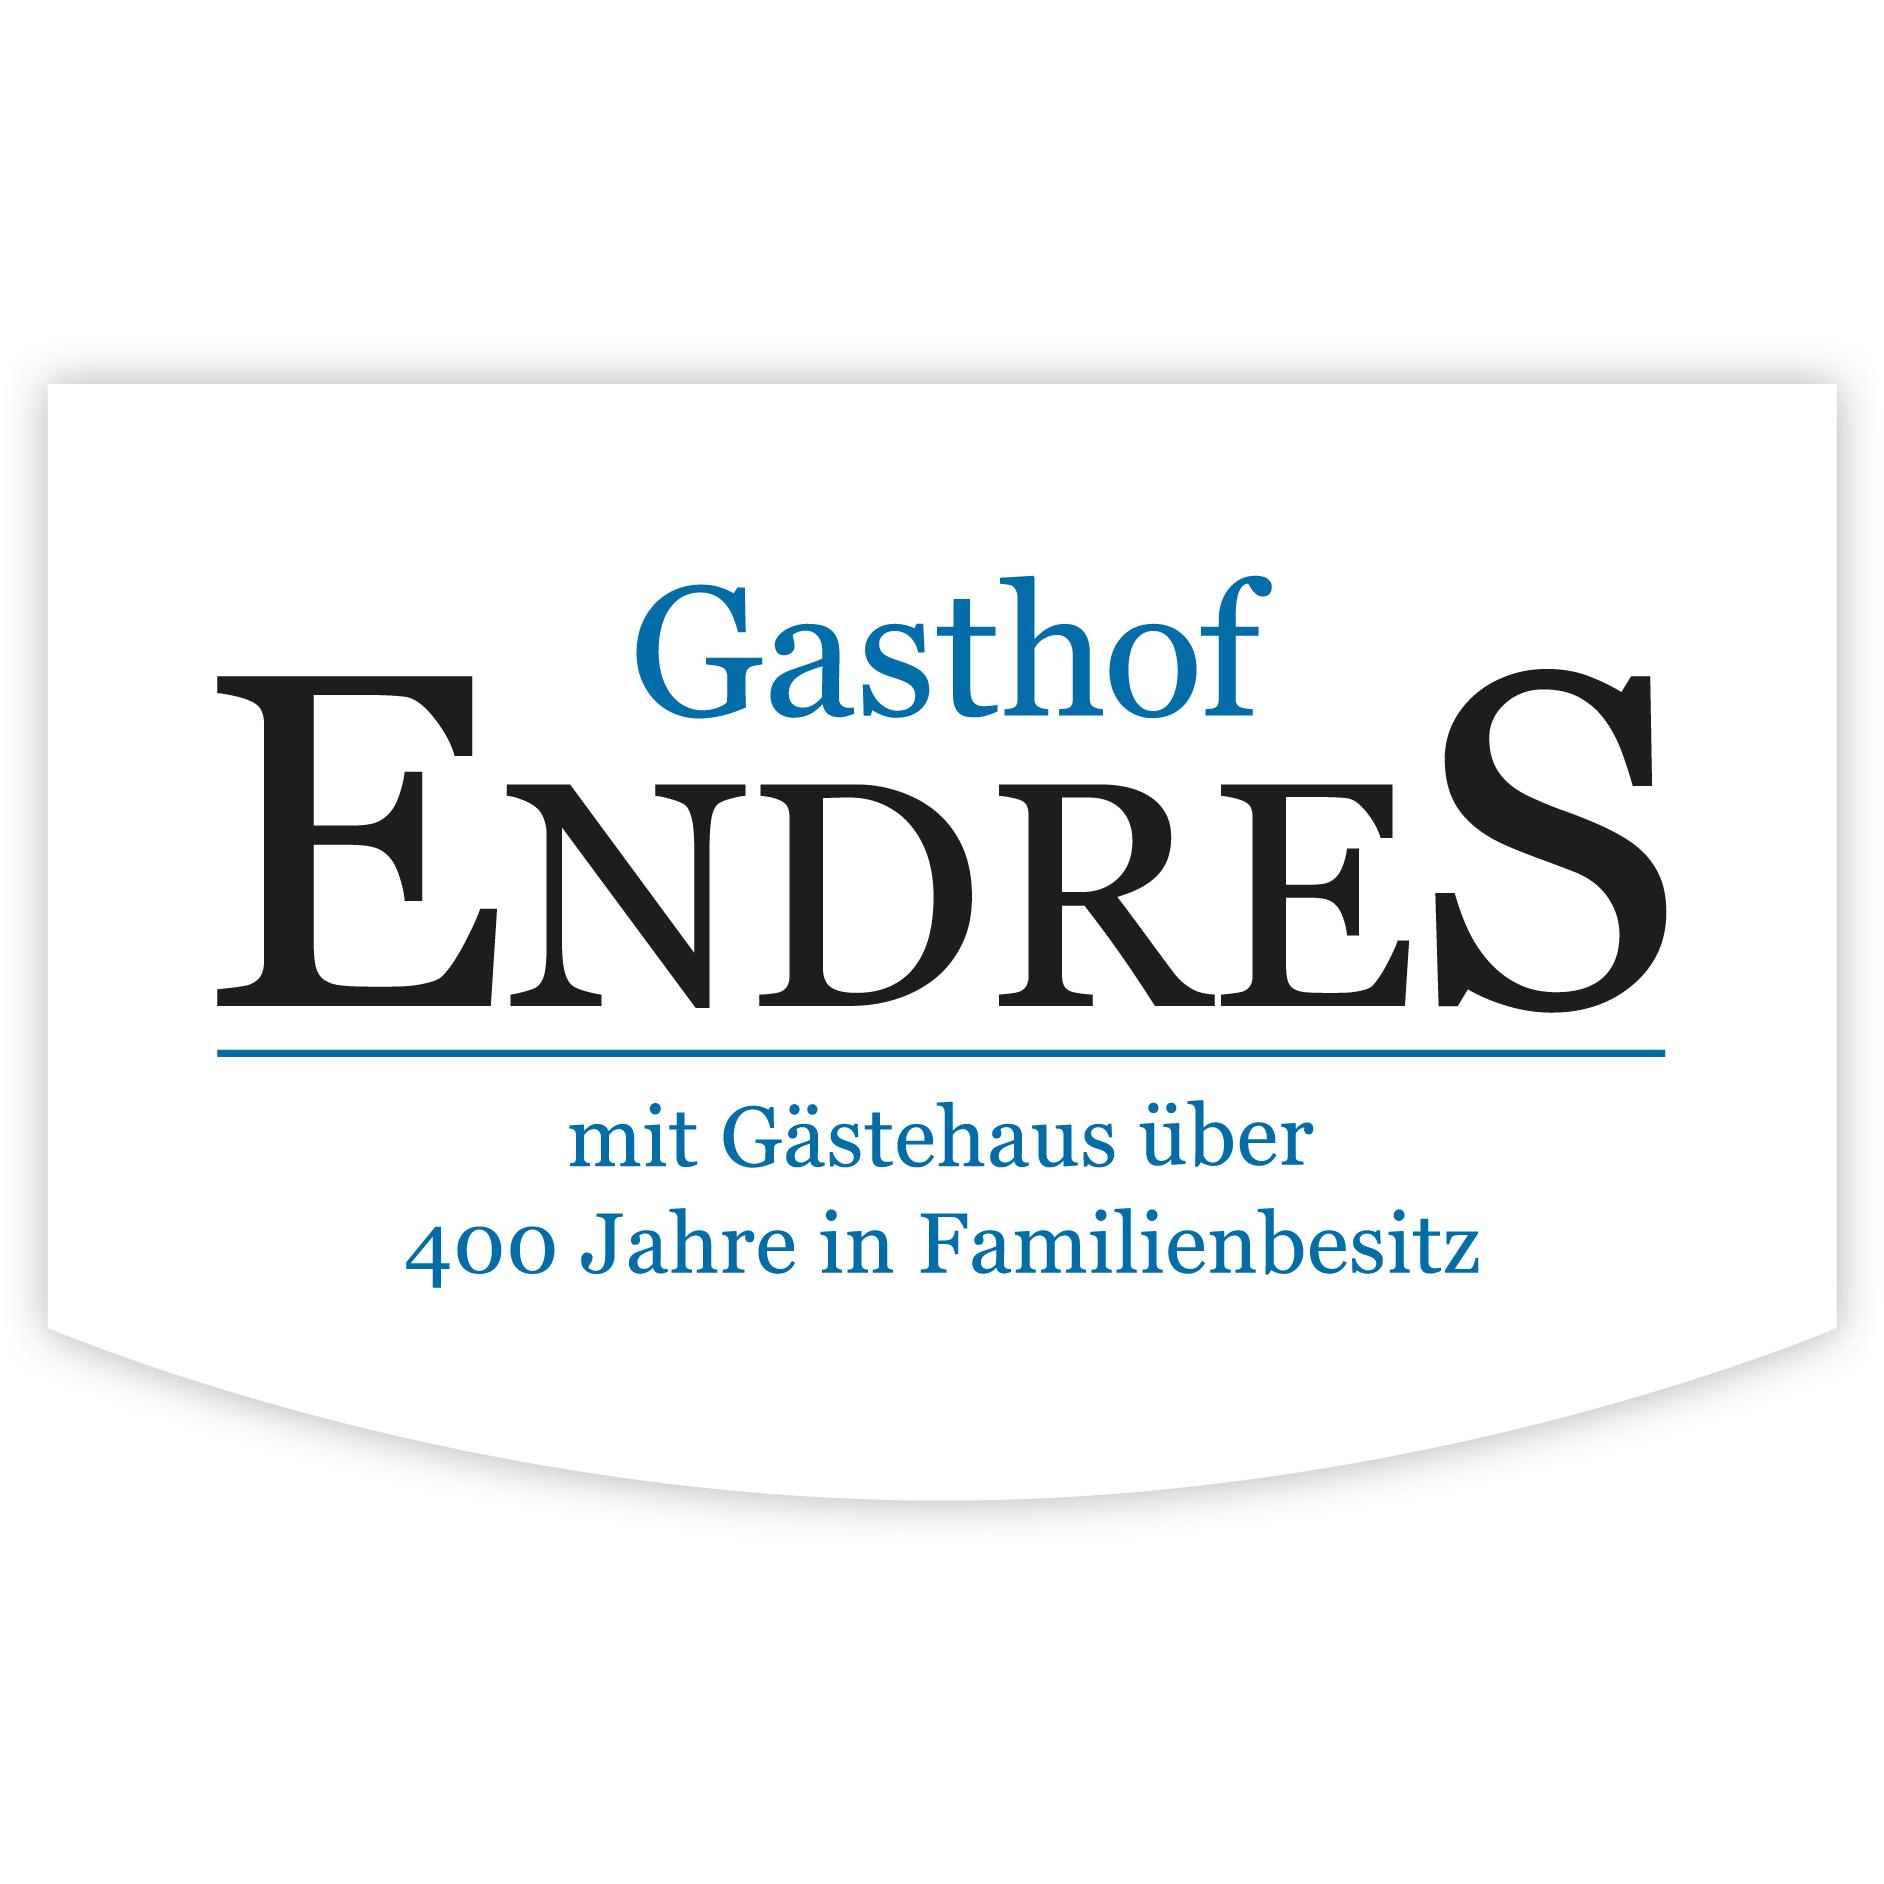 Bild zu Nadja Endres Gasthof mit Gästehaus in Allersberg